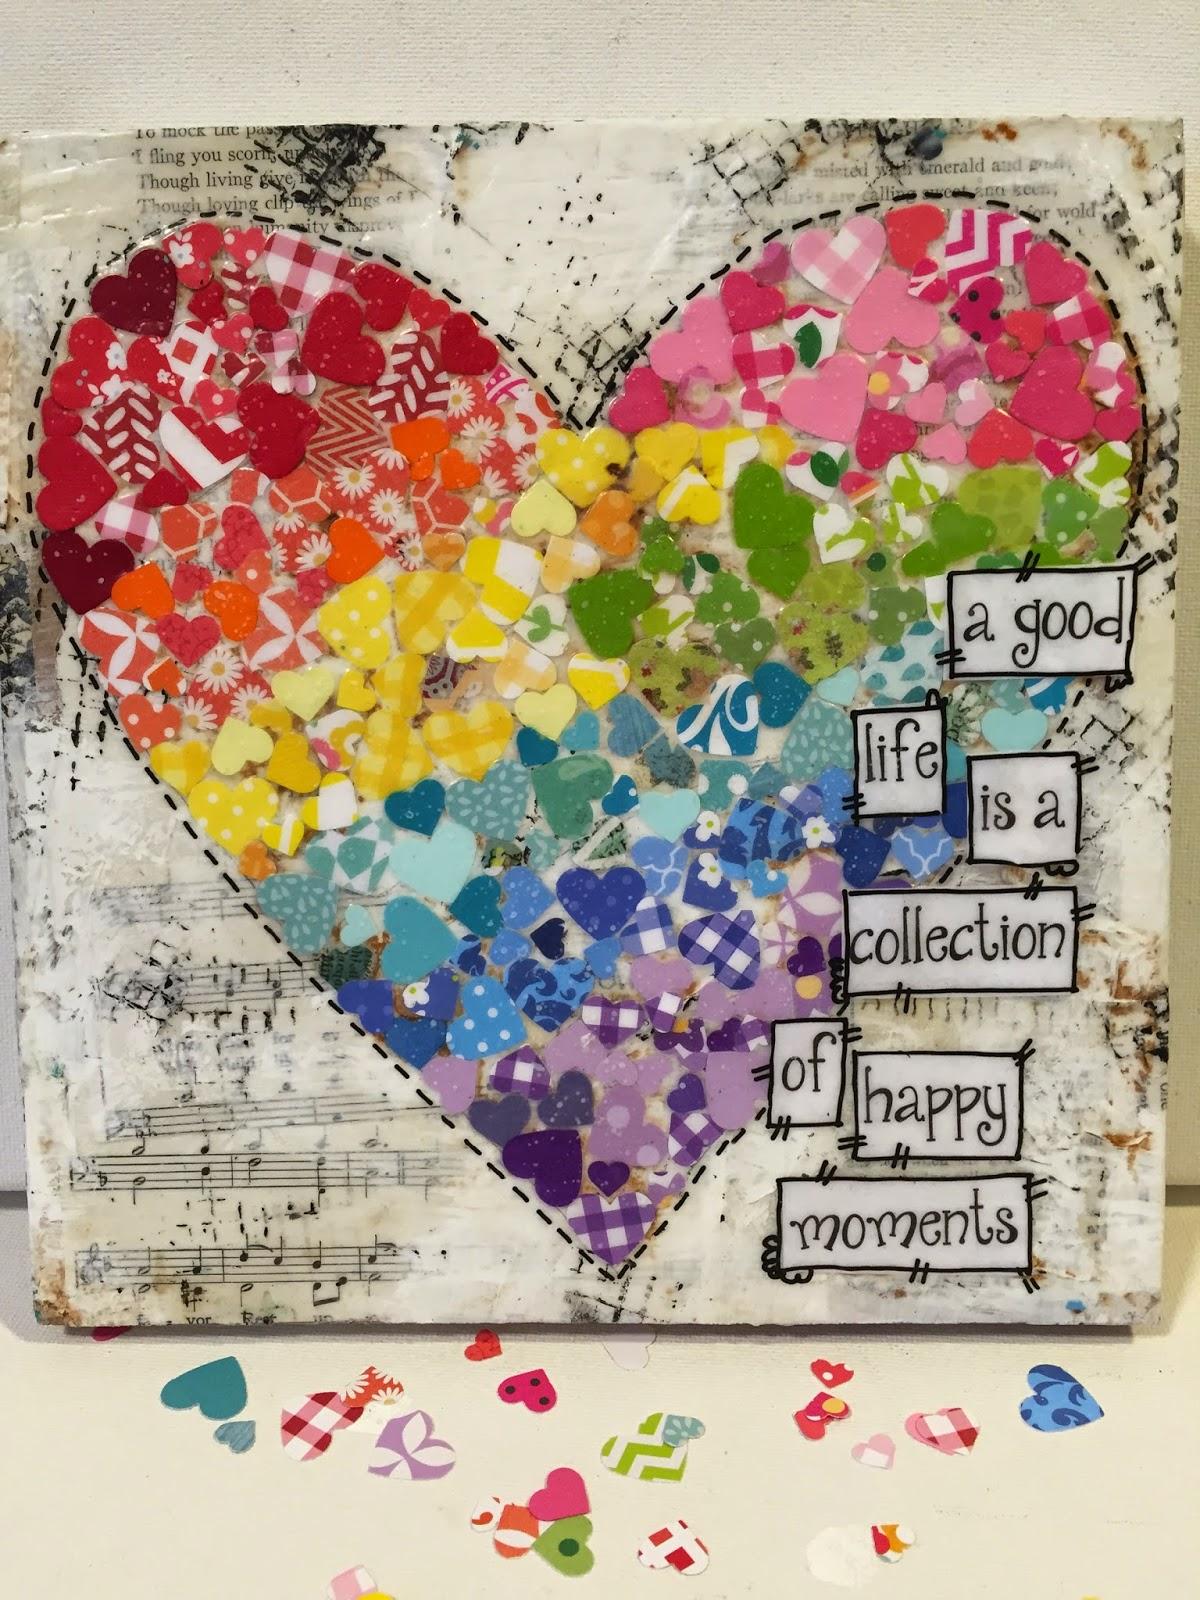 https://www.etsy.com/listing/221123008/rainbow-heart-heart-decor-heart-sign-a?ref=shop_home_active_1